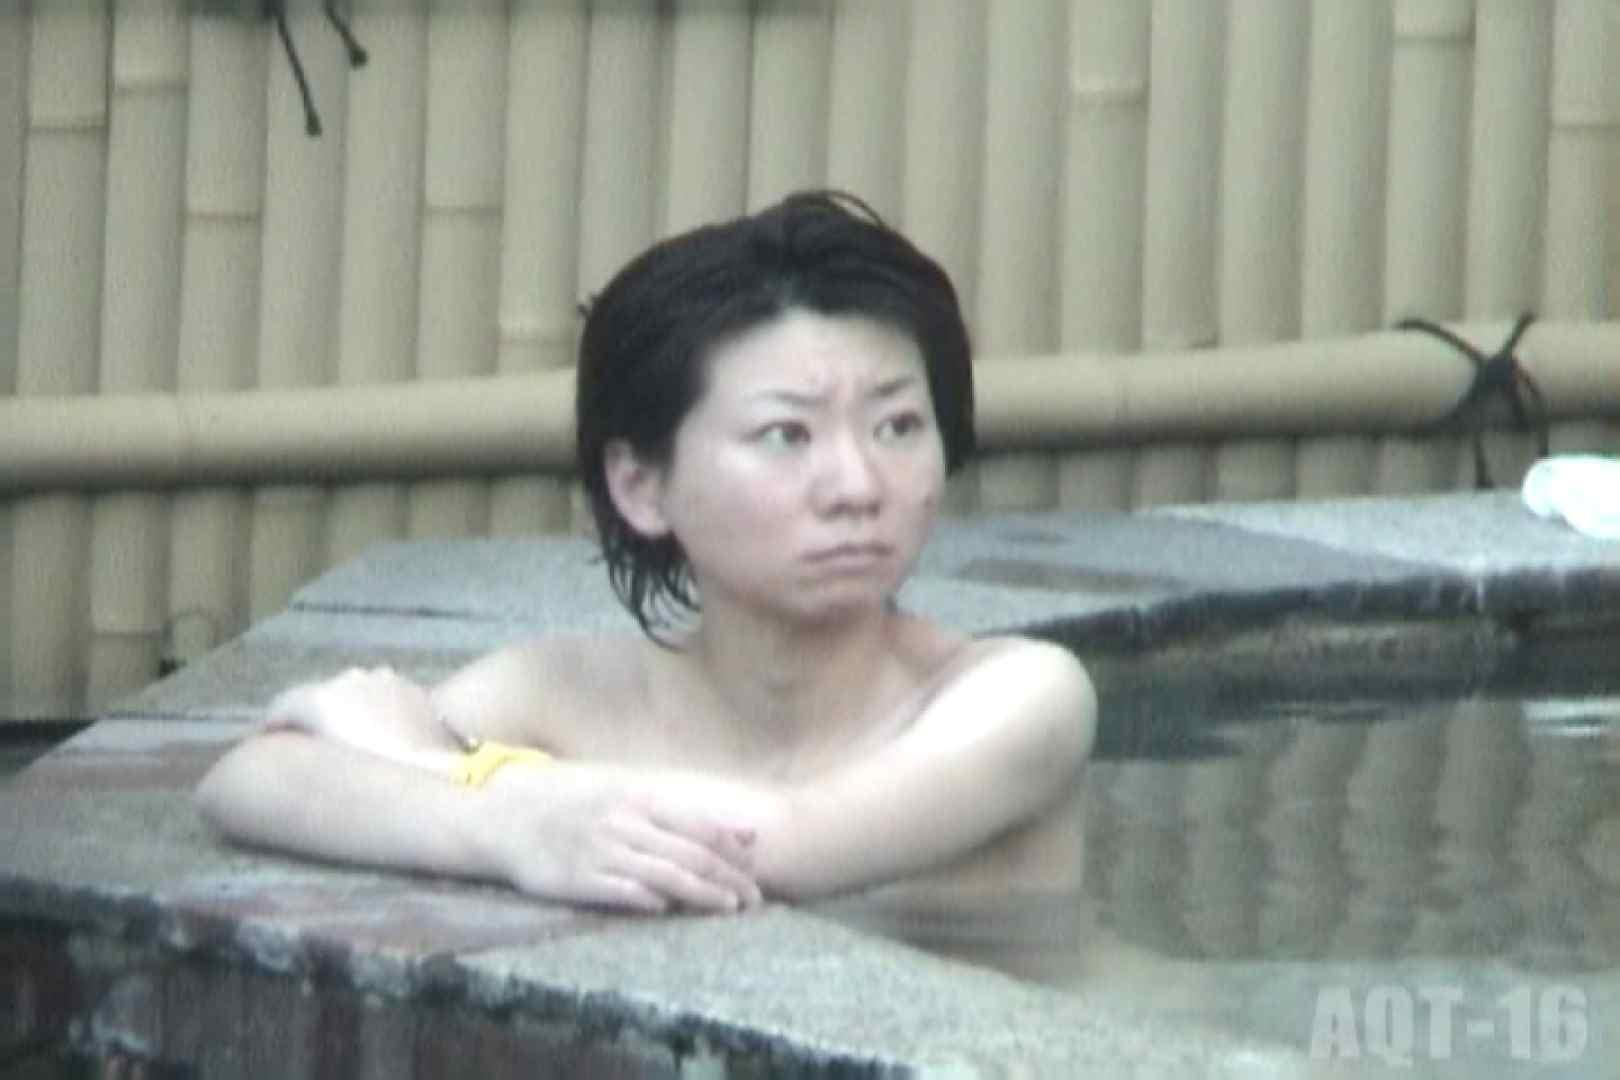 Aquaな露天風呂Vol.842 露天風呂突入 AV動画キャプチャ 96pic 86